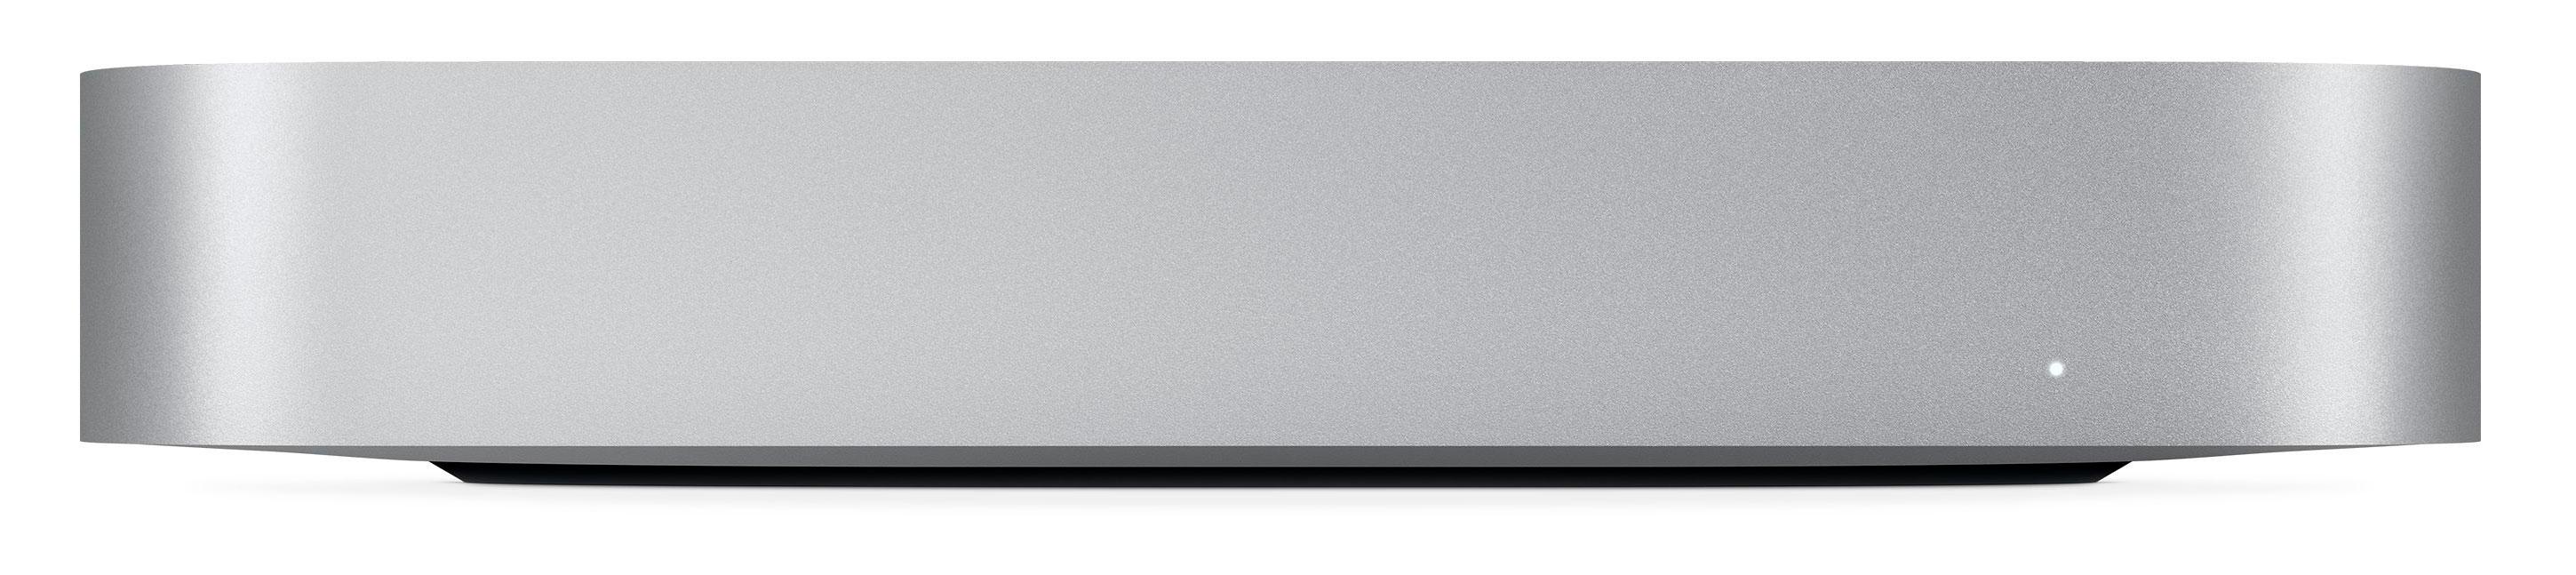 Mac mini - Apple M1‑chip met 8‑core CPU en 8‑core GPU - 8 GB RAM - 256 GB opslag (Open box)